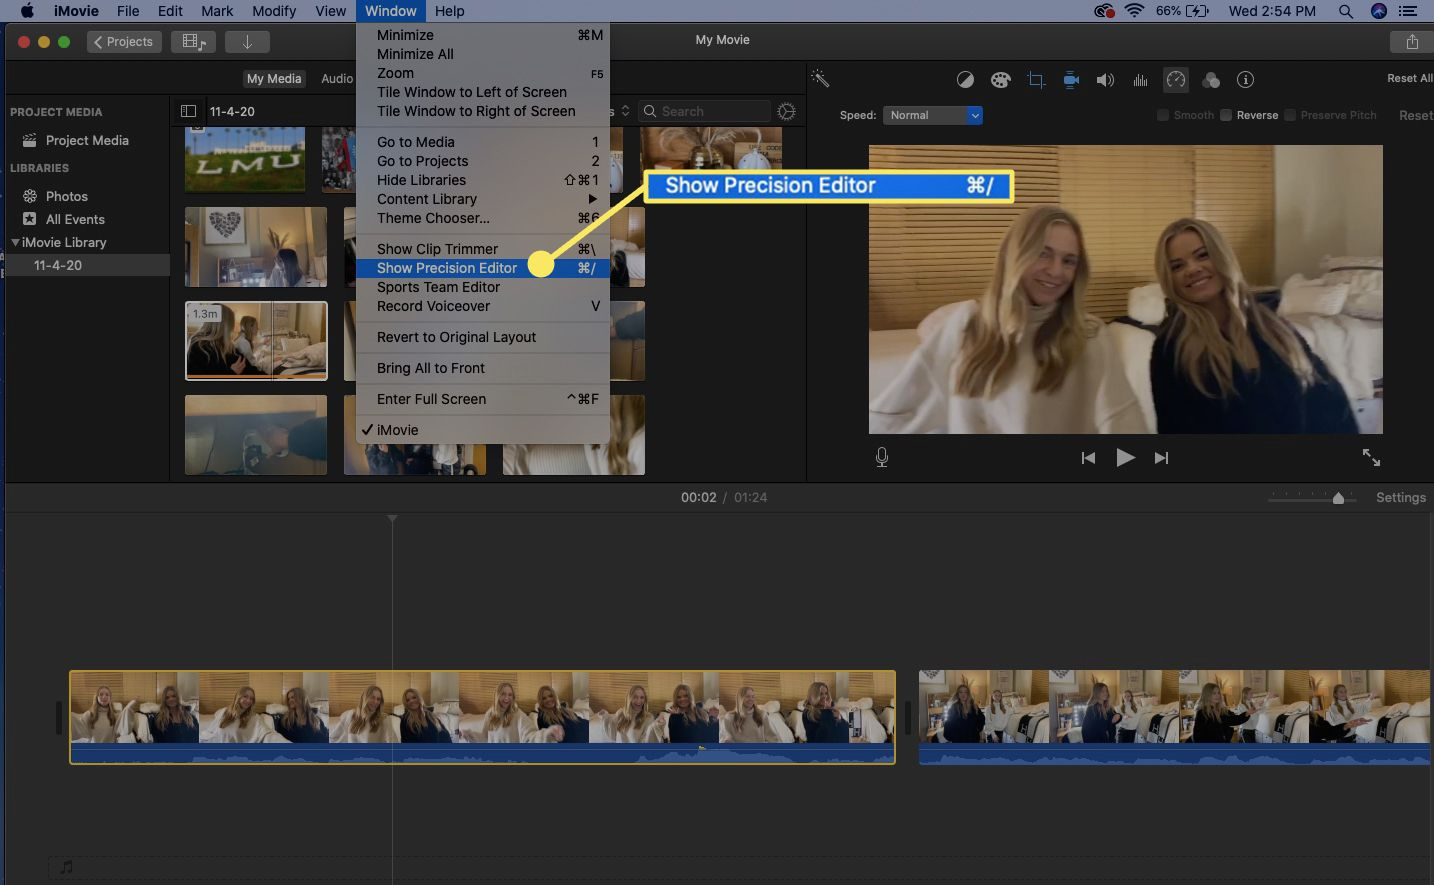 Access the iMovie Precision Editor from the Window menu.